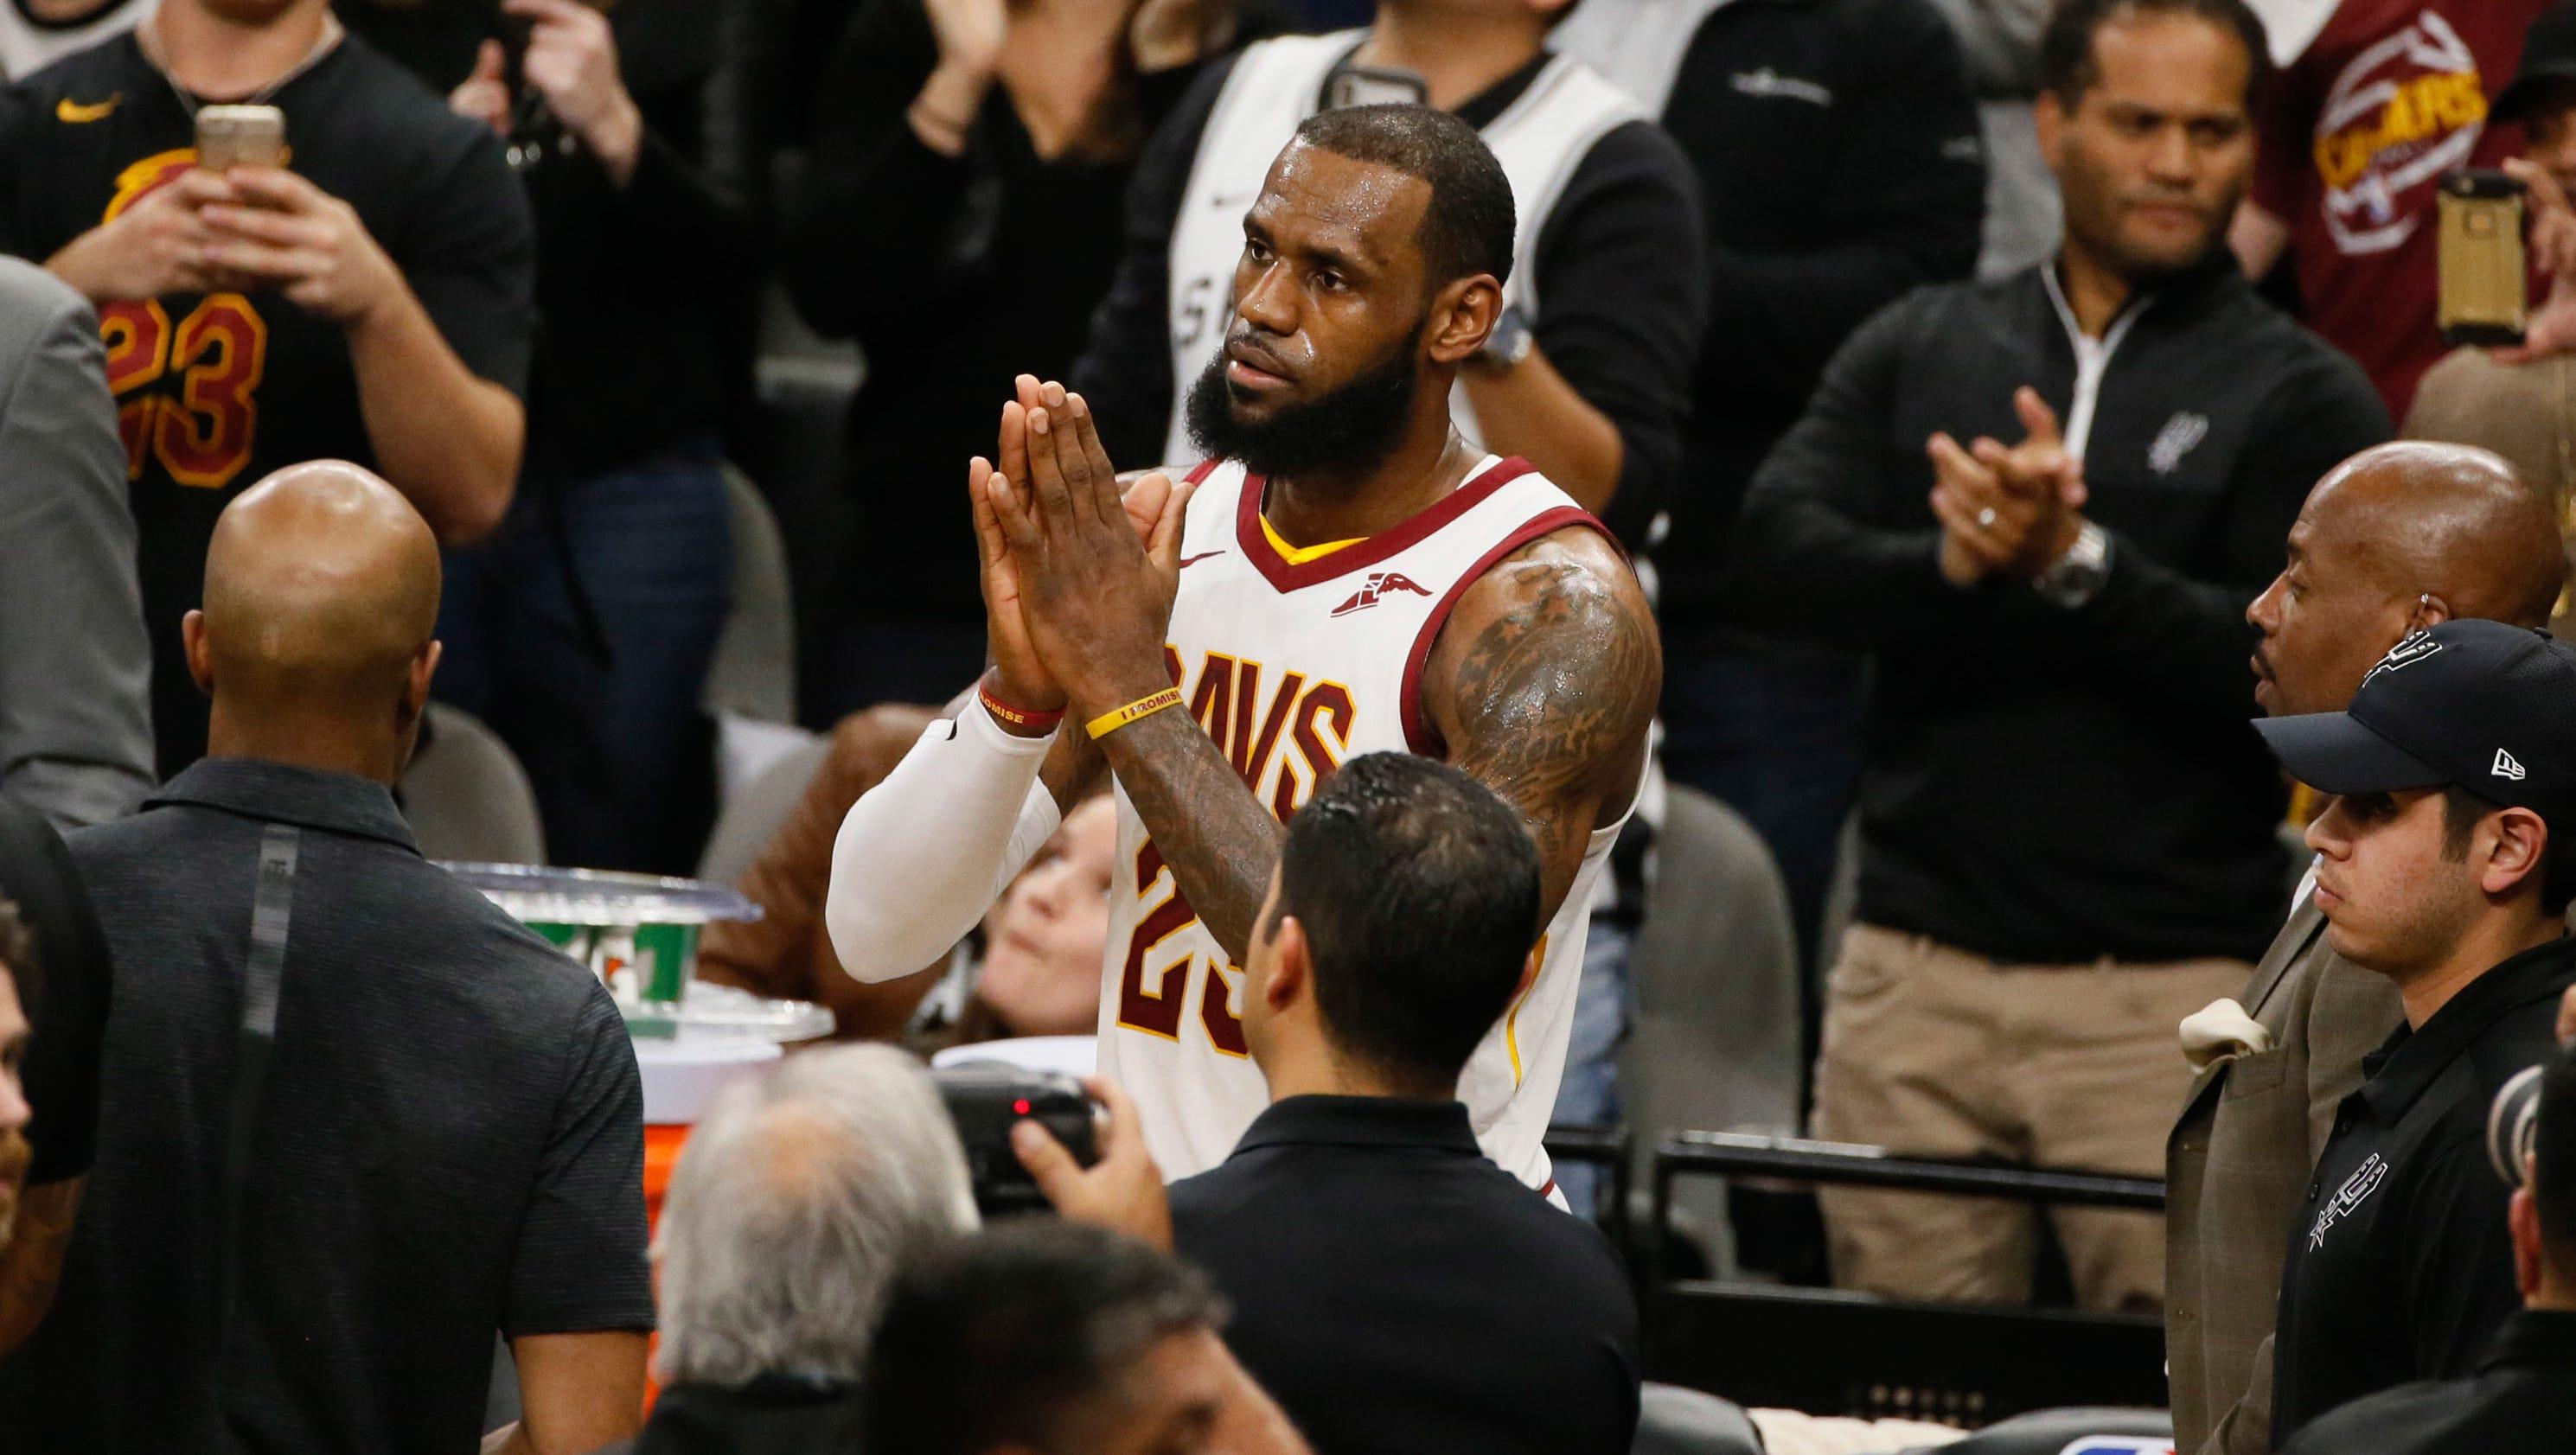 Can LeBron James pass Kareem Abdul-Jabbar as NBA's all-time leading scorer?